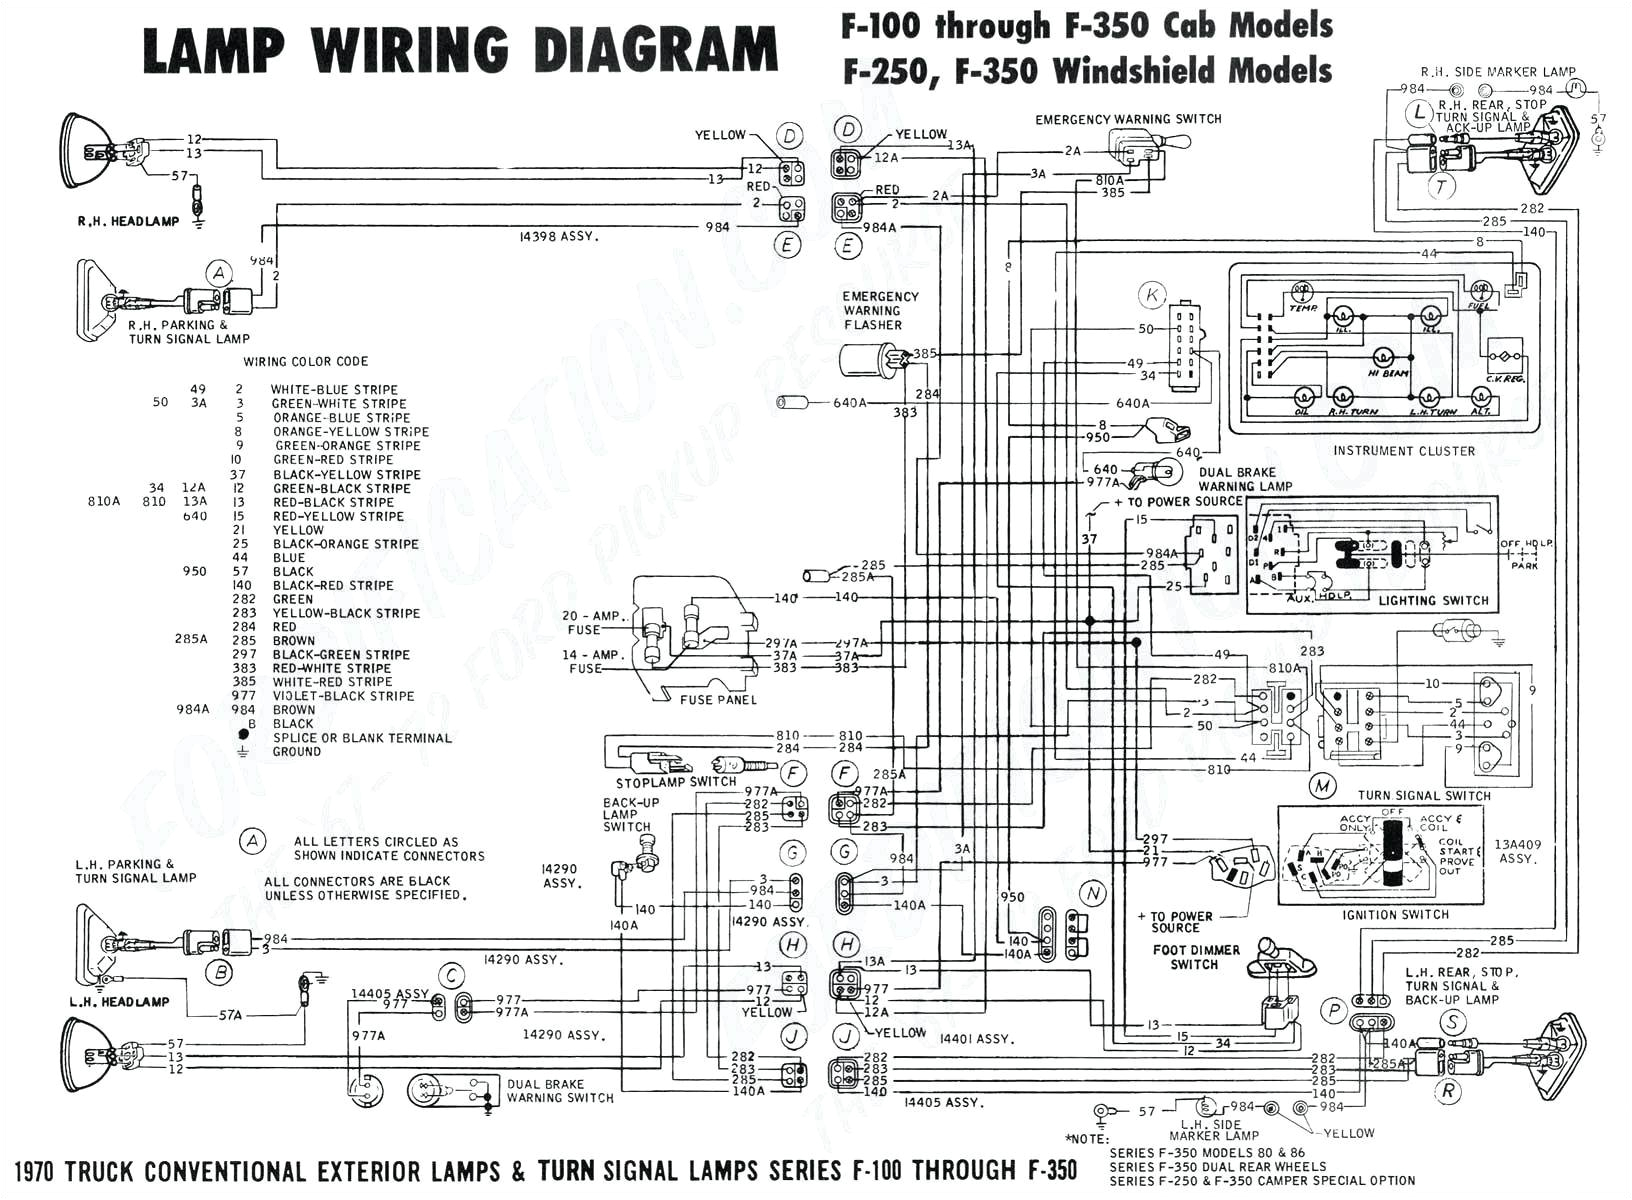 w163 wiring diagram wiring diagram datasourcew163 wiring diagram wiring diagram w163 bose wiring diagram mercedes ml320